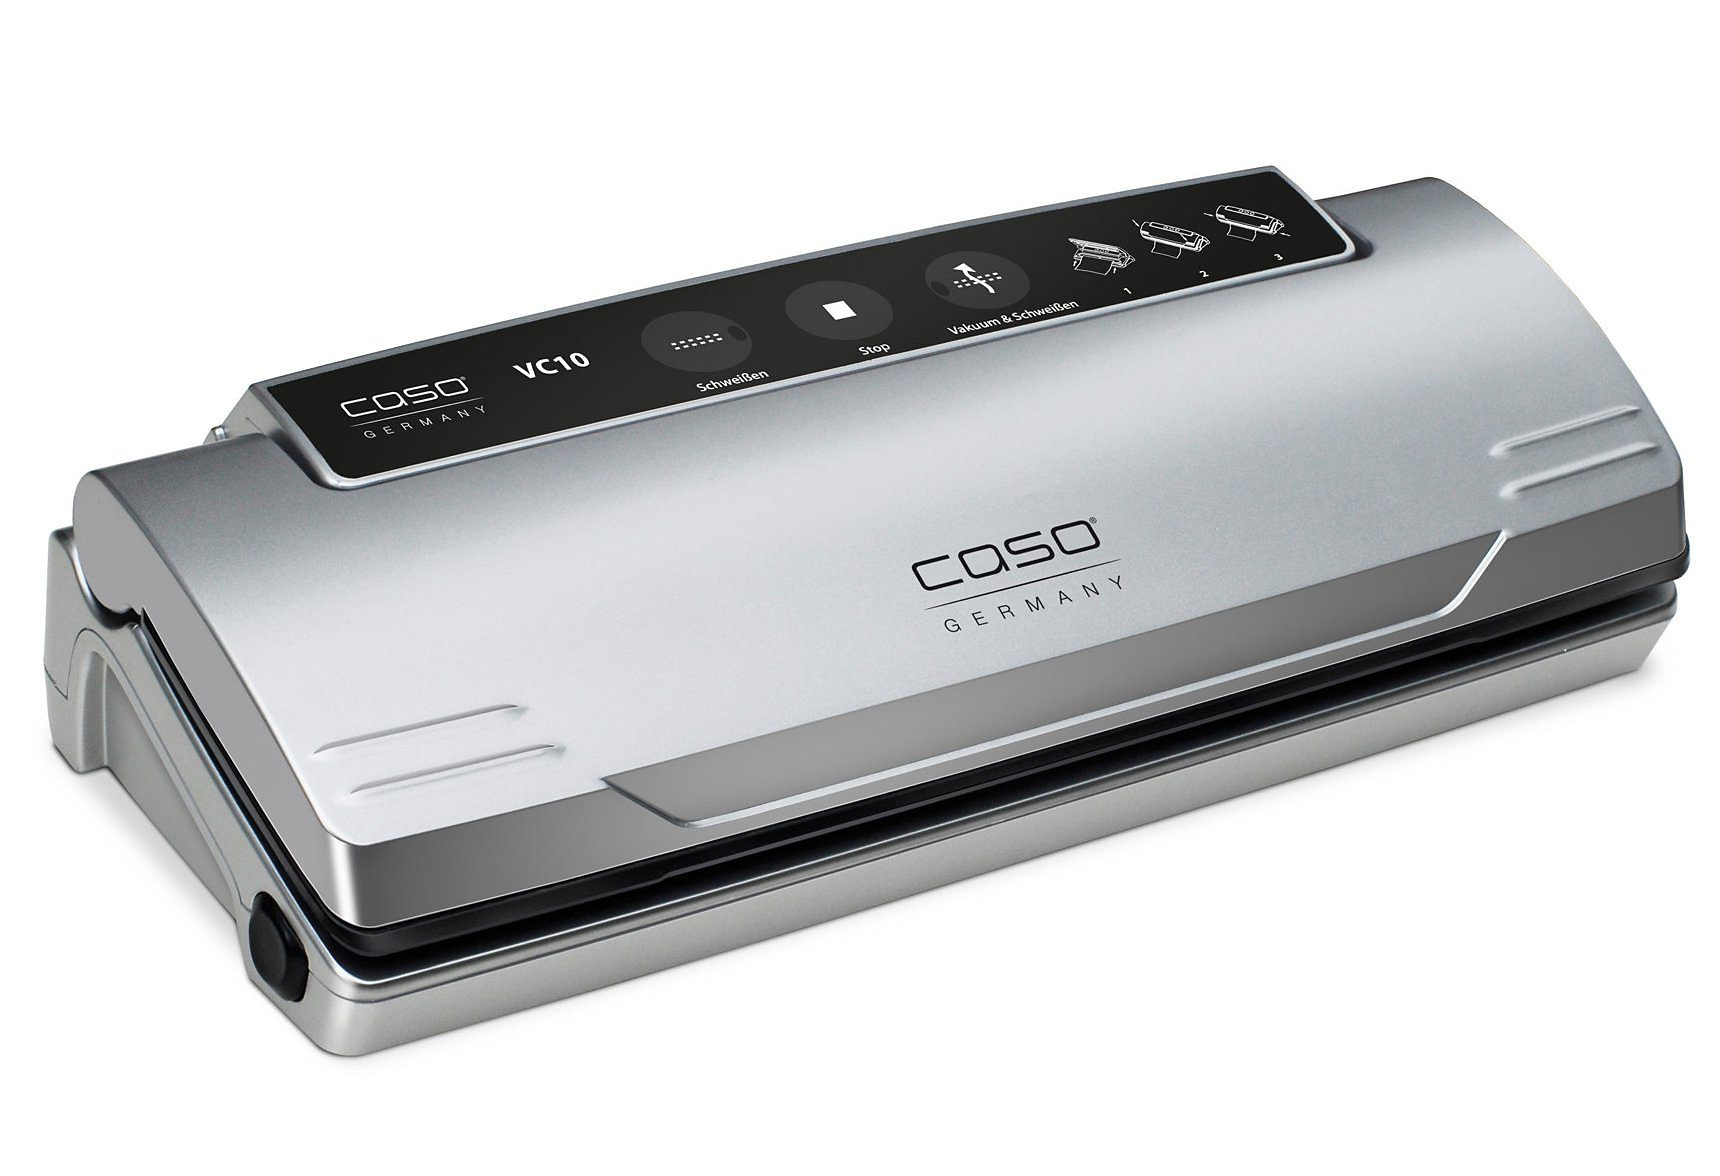 Caso Germany Vakuumierer »VC10«, Inkl. 10 gratis Profi-Beutel, sep. Schweißfunktion